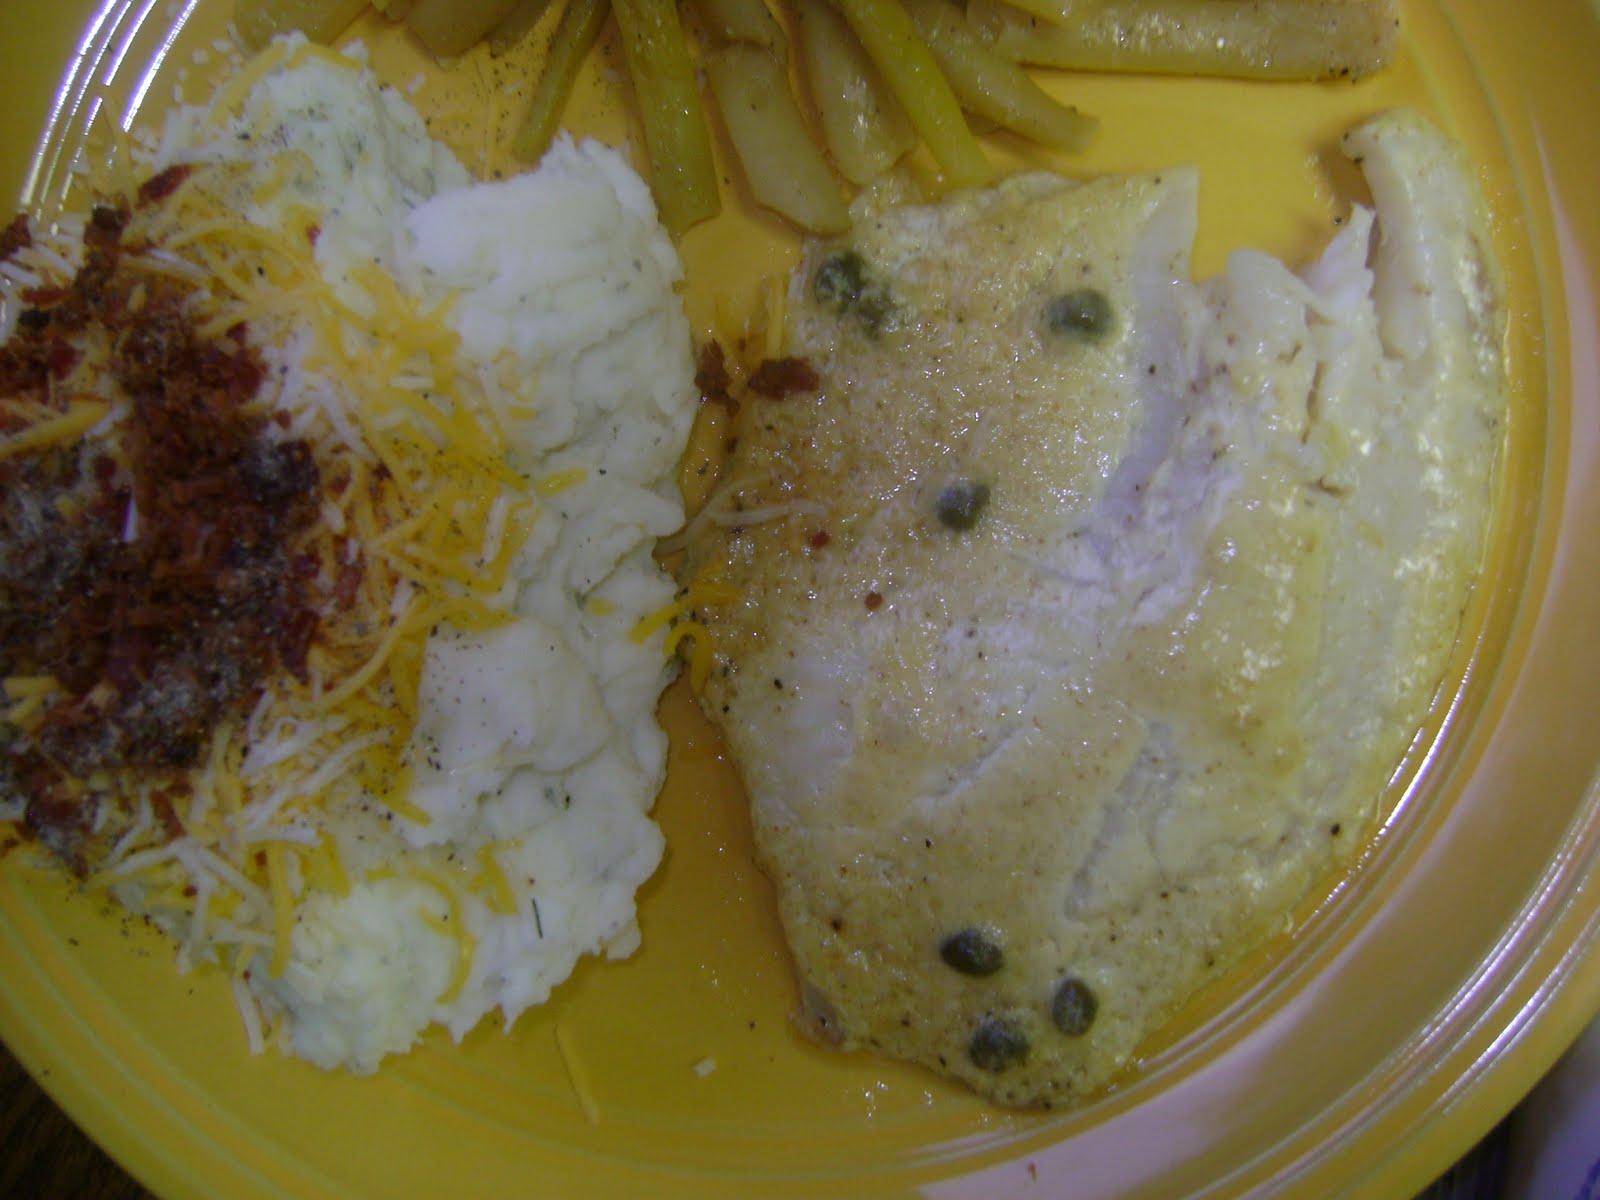 Stuffing my fat fatty face mustard coated fish for Ina garten mustard fish